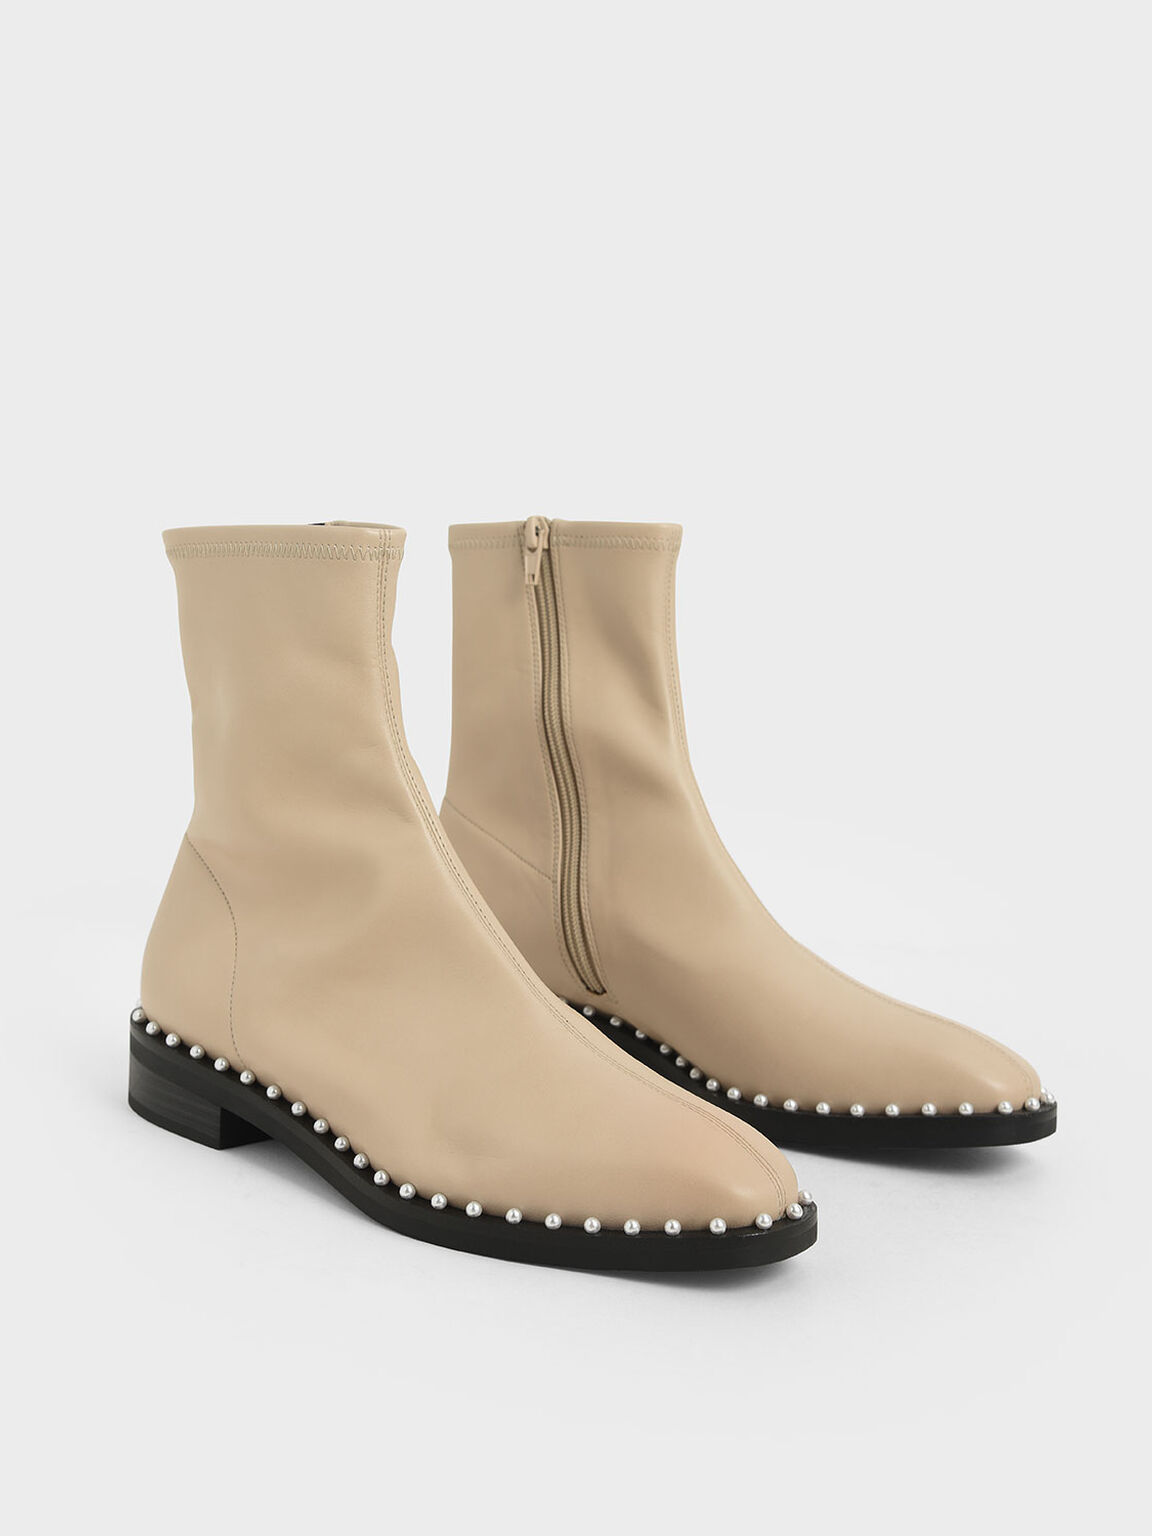 Stud-Trim Ankle Boots, Beige, hi-res